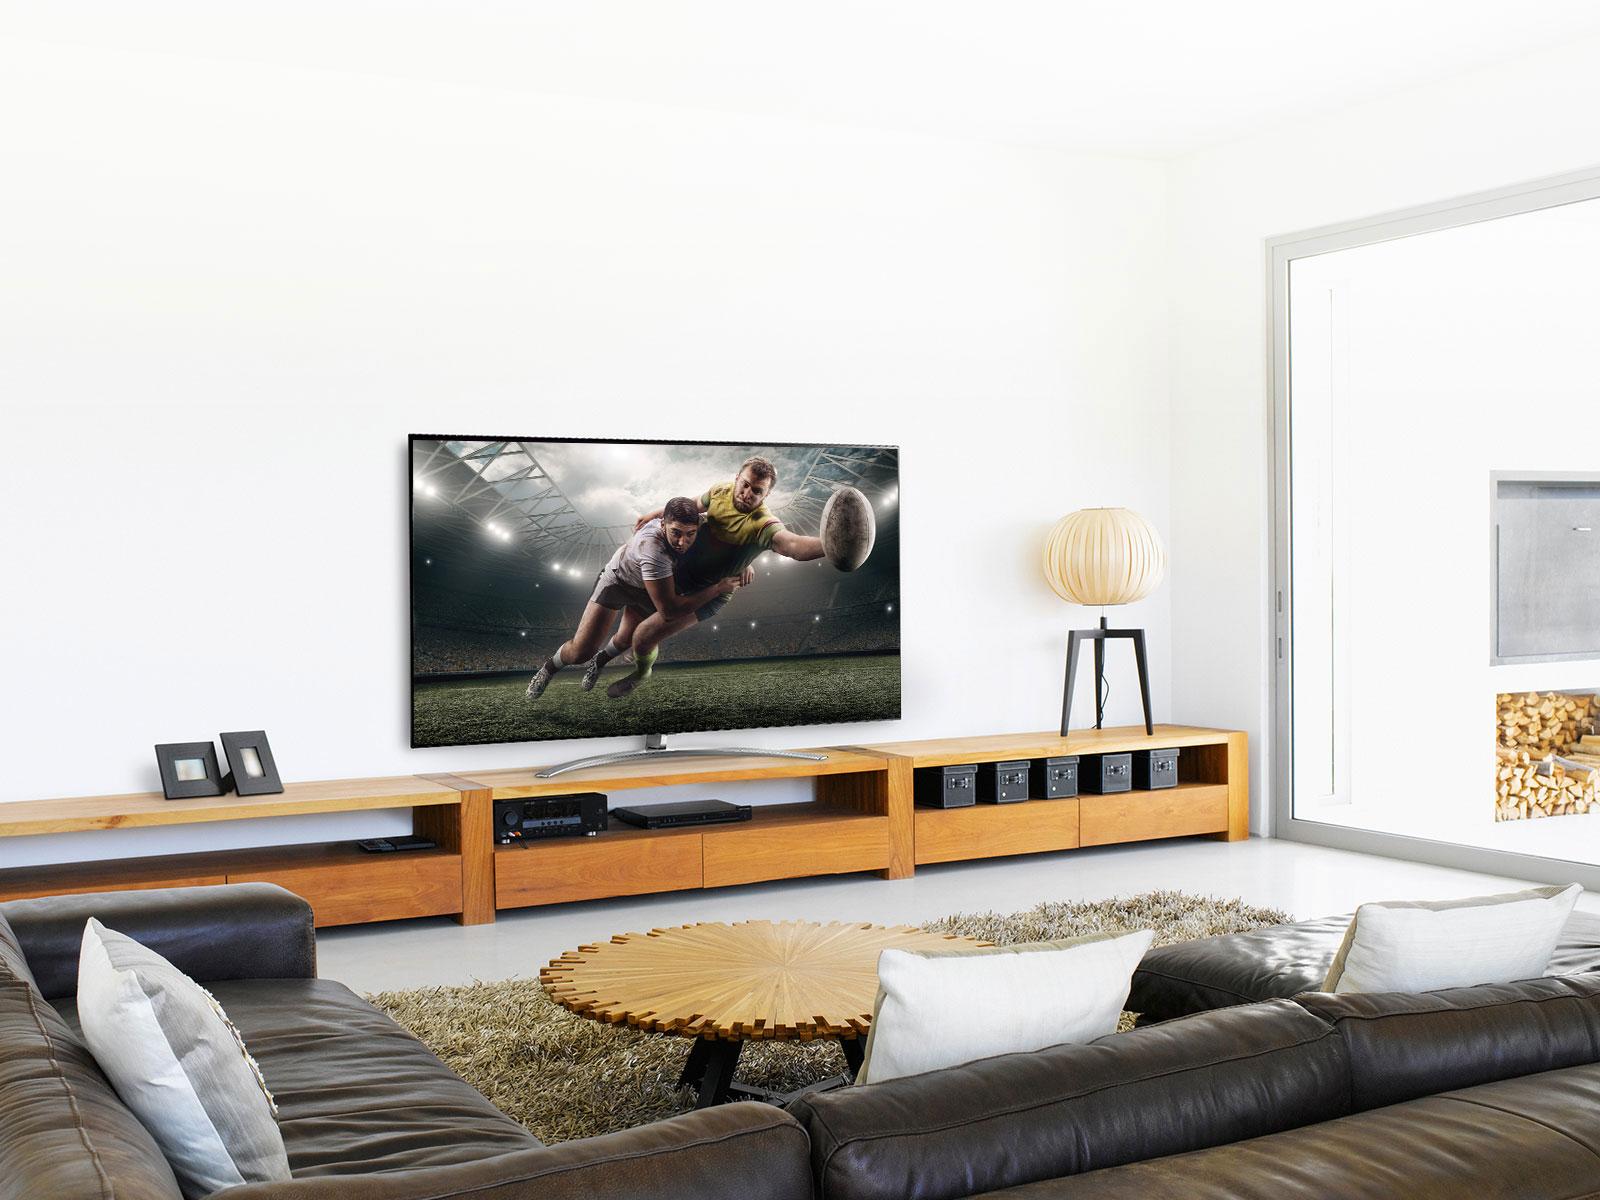 قیمت تلویزیون 55 اینج ال جی مدل 55SM9000